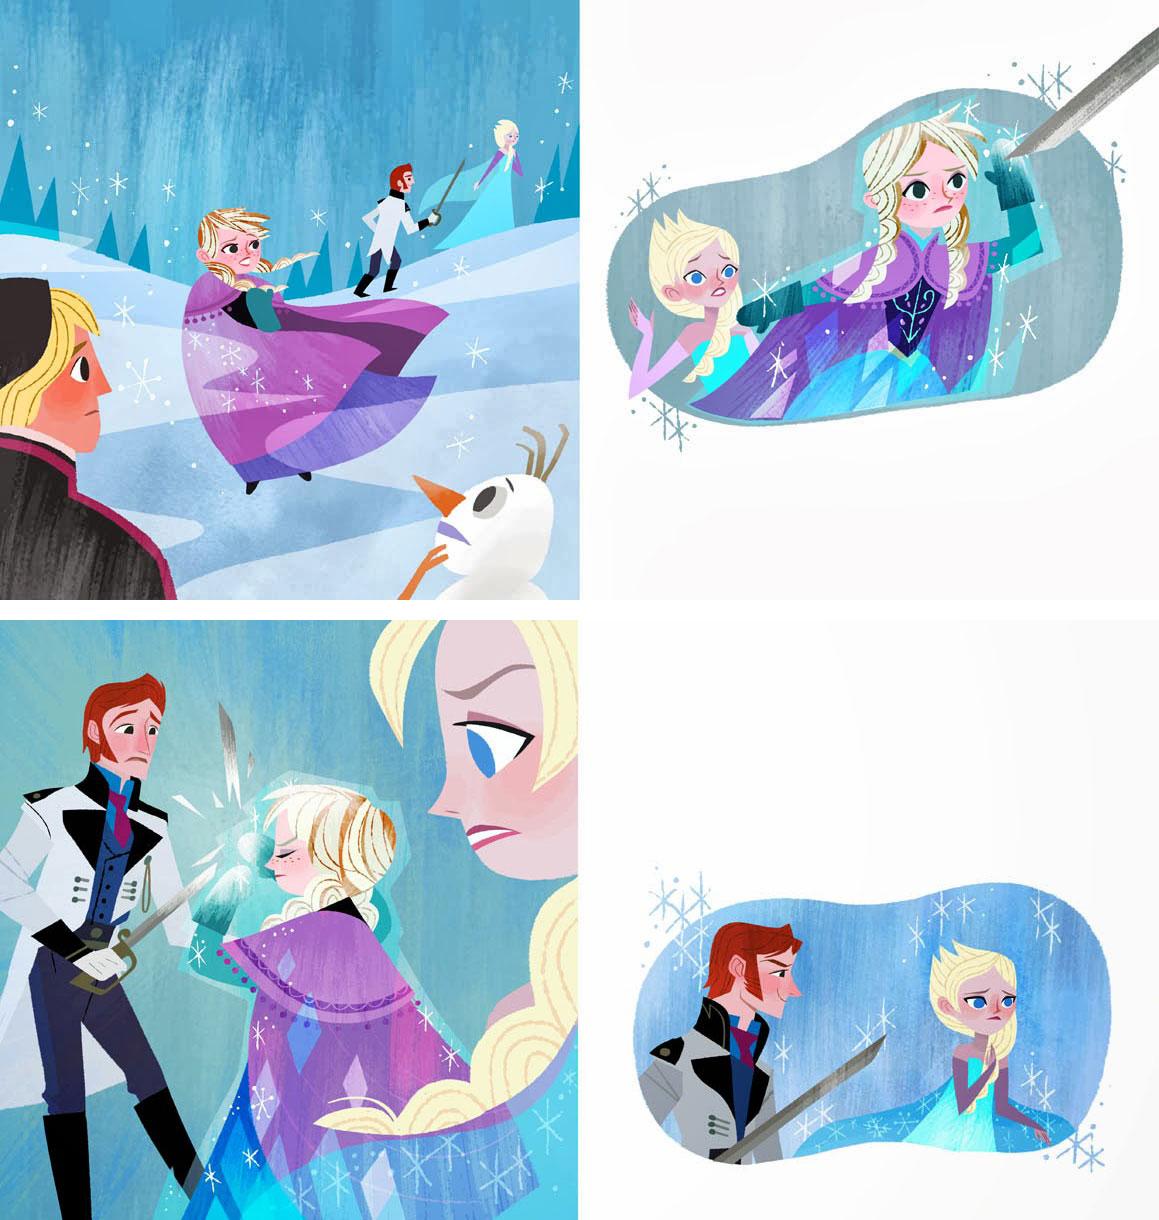 Frozen: Anna's Act of Love/Elsa's Icy Magic